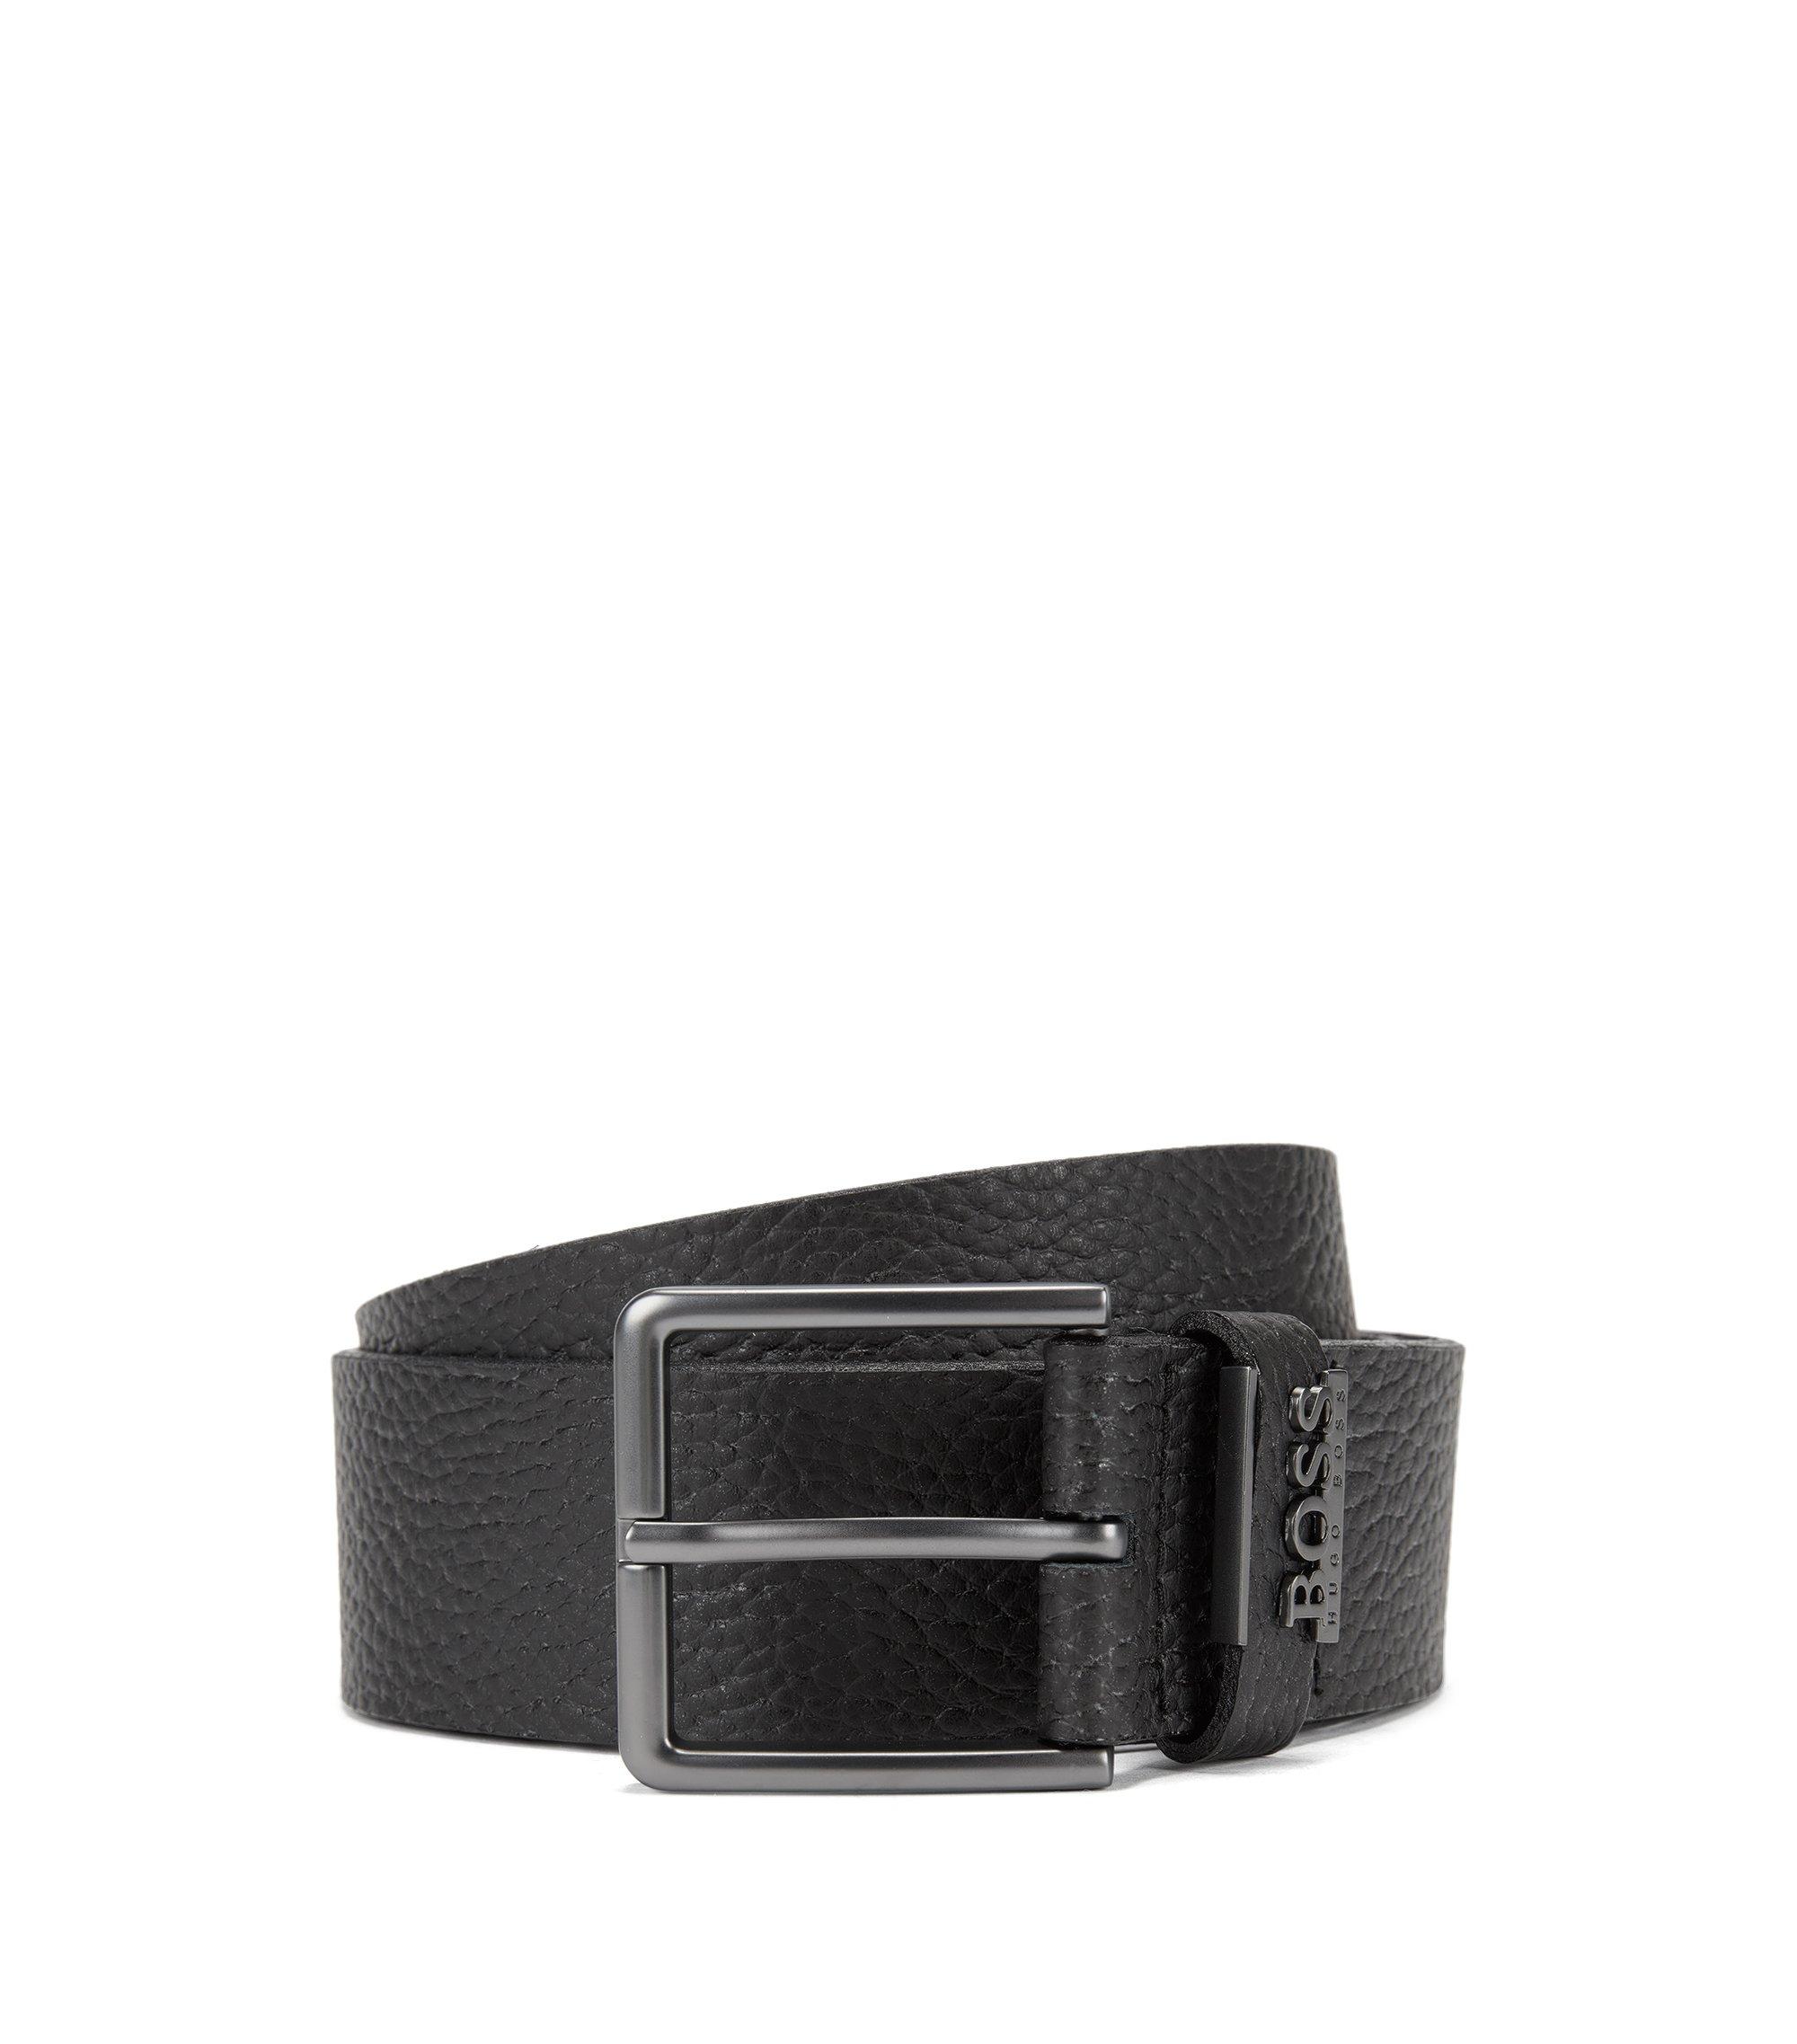 Grained-leather belt with matt gunmetal hardware, Black